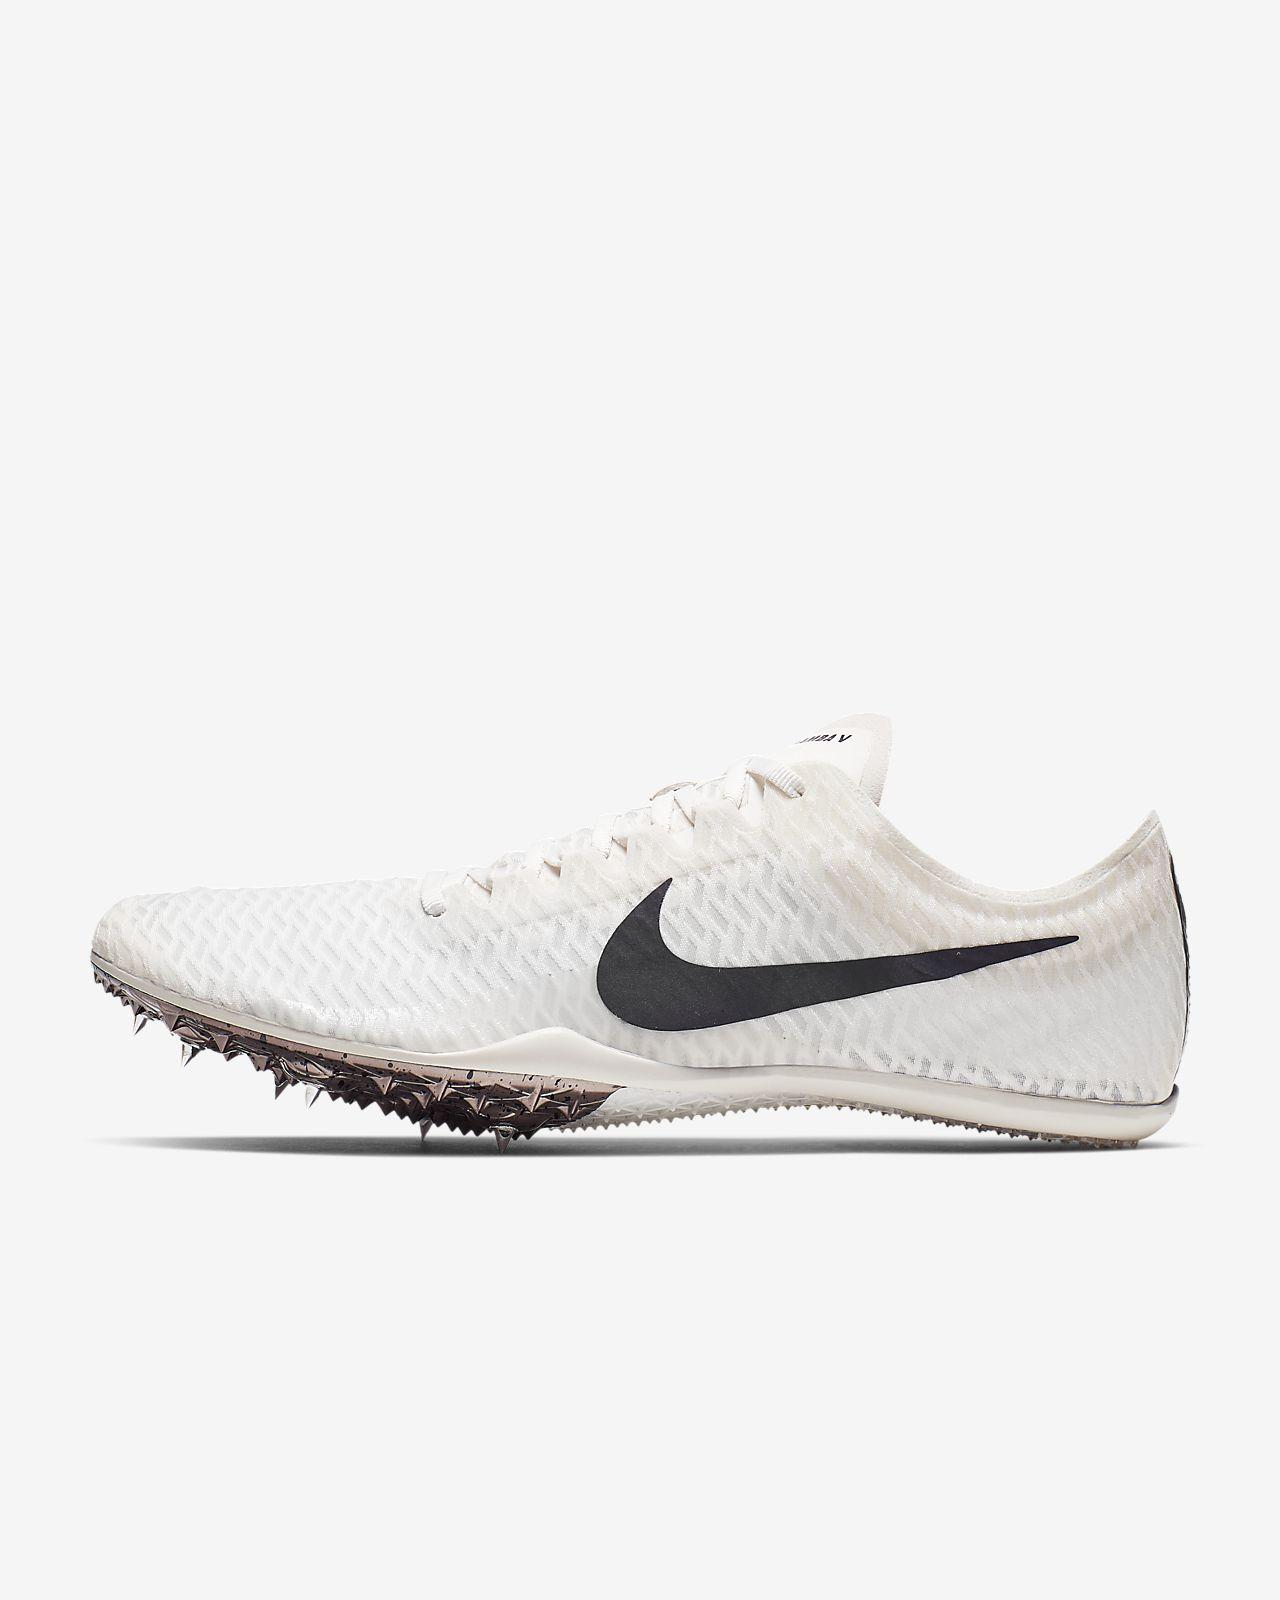 Nike Zoom Mamba V Laufschuh